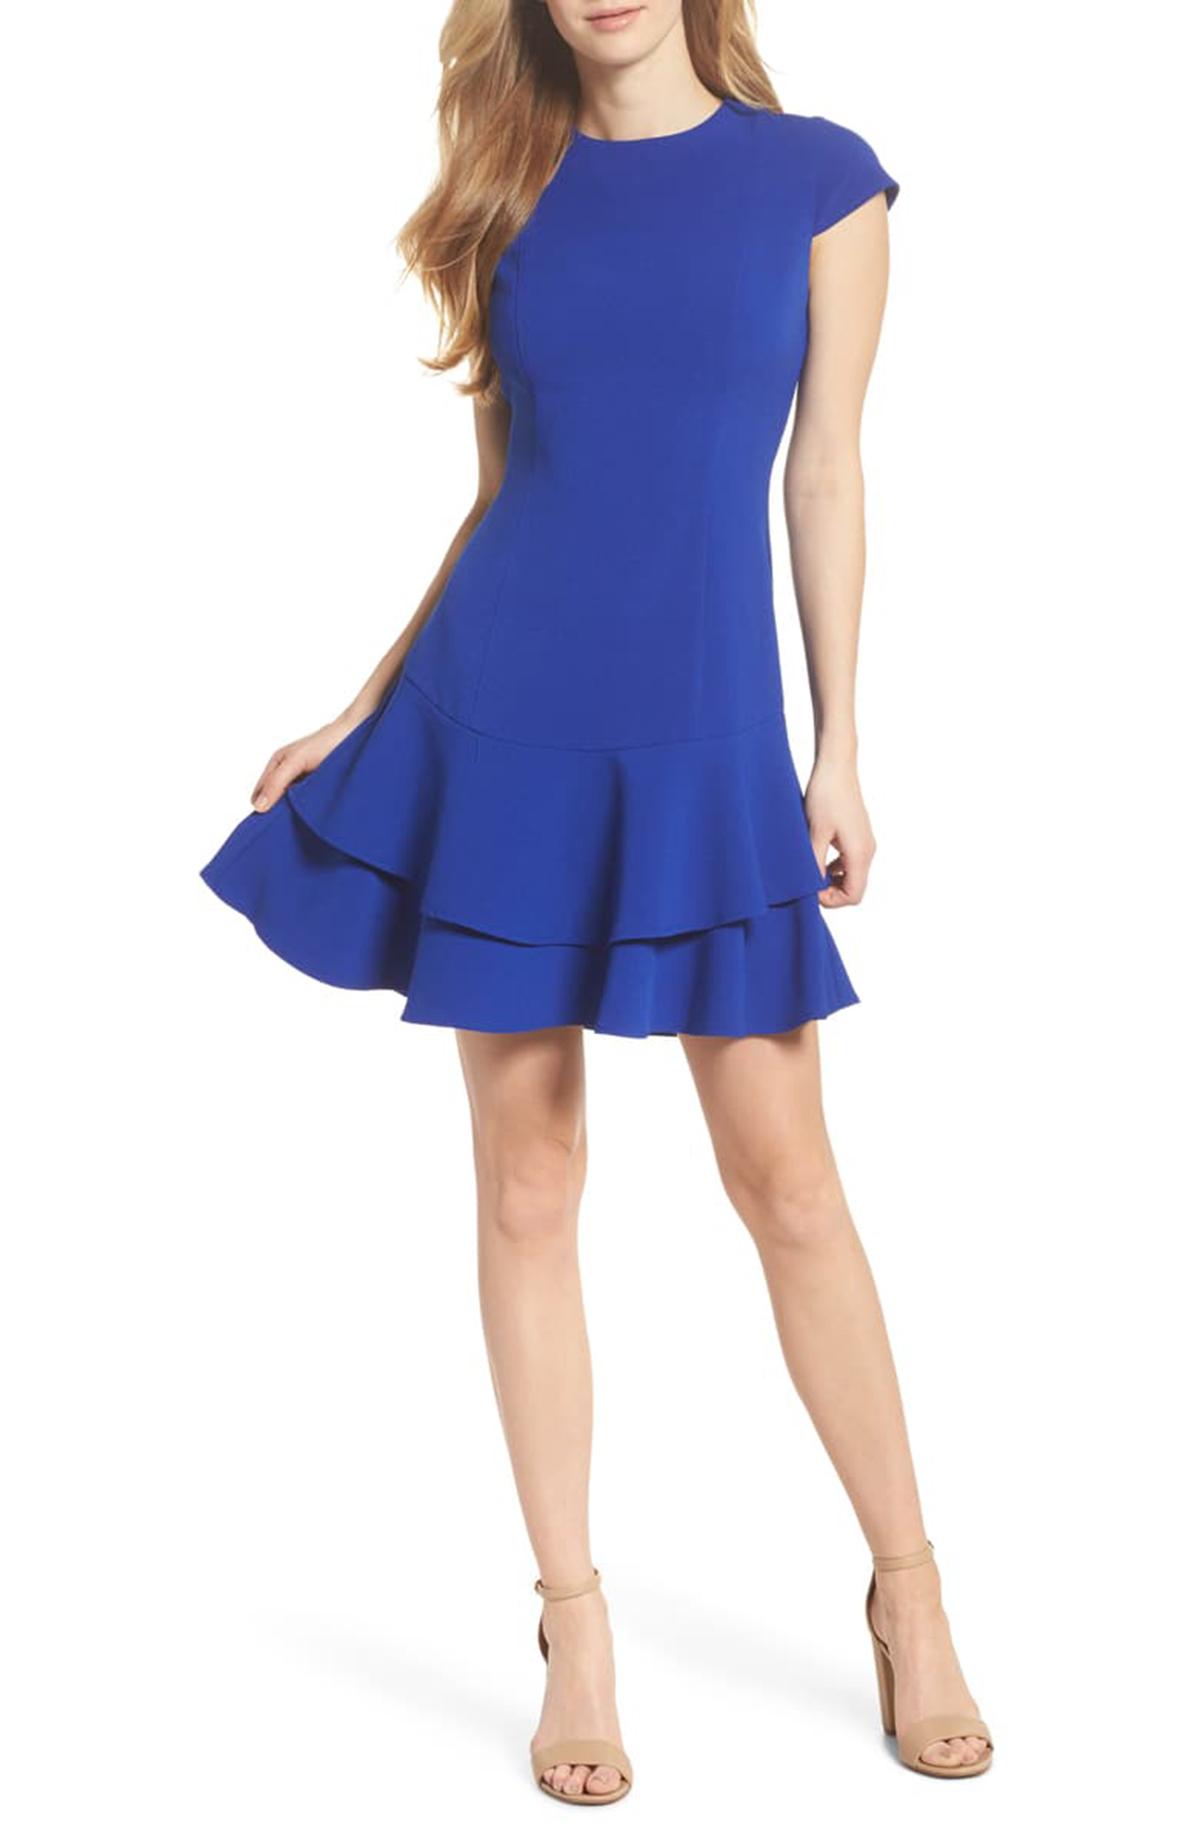 dress-pic-one